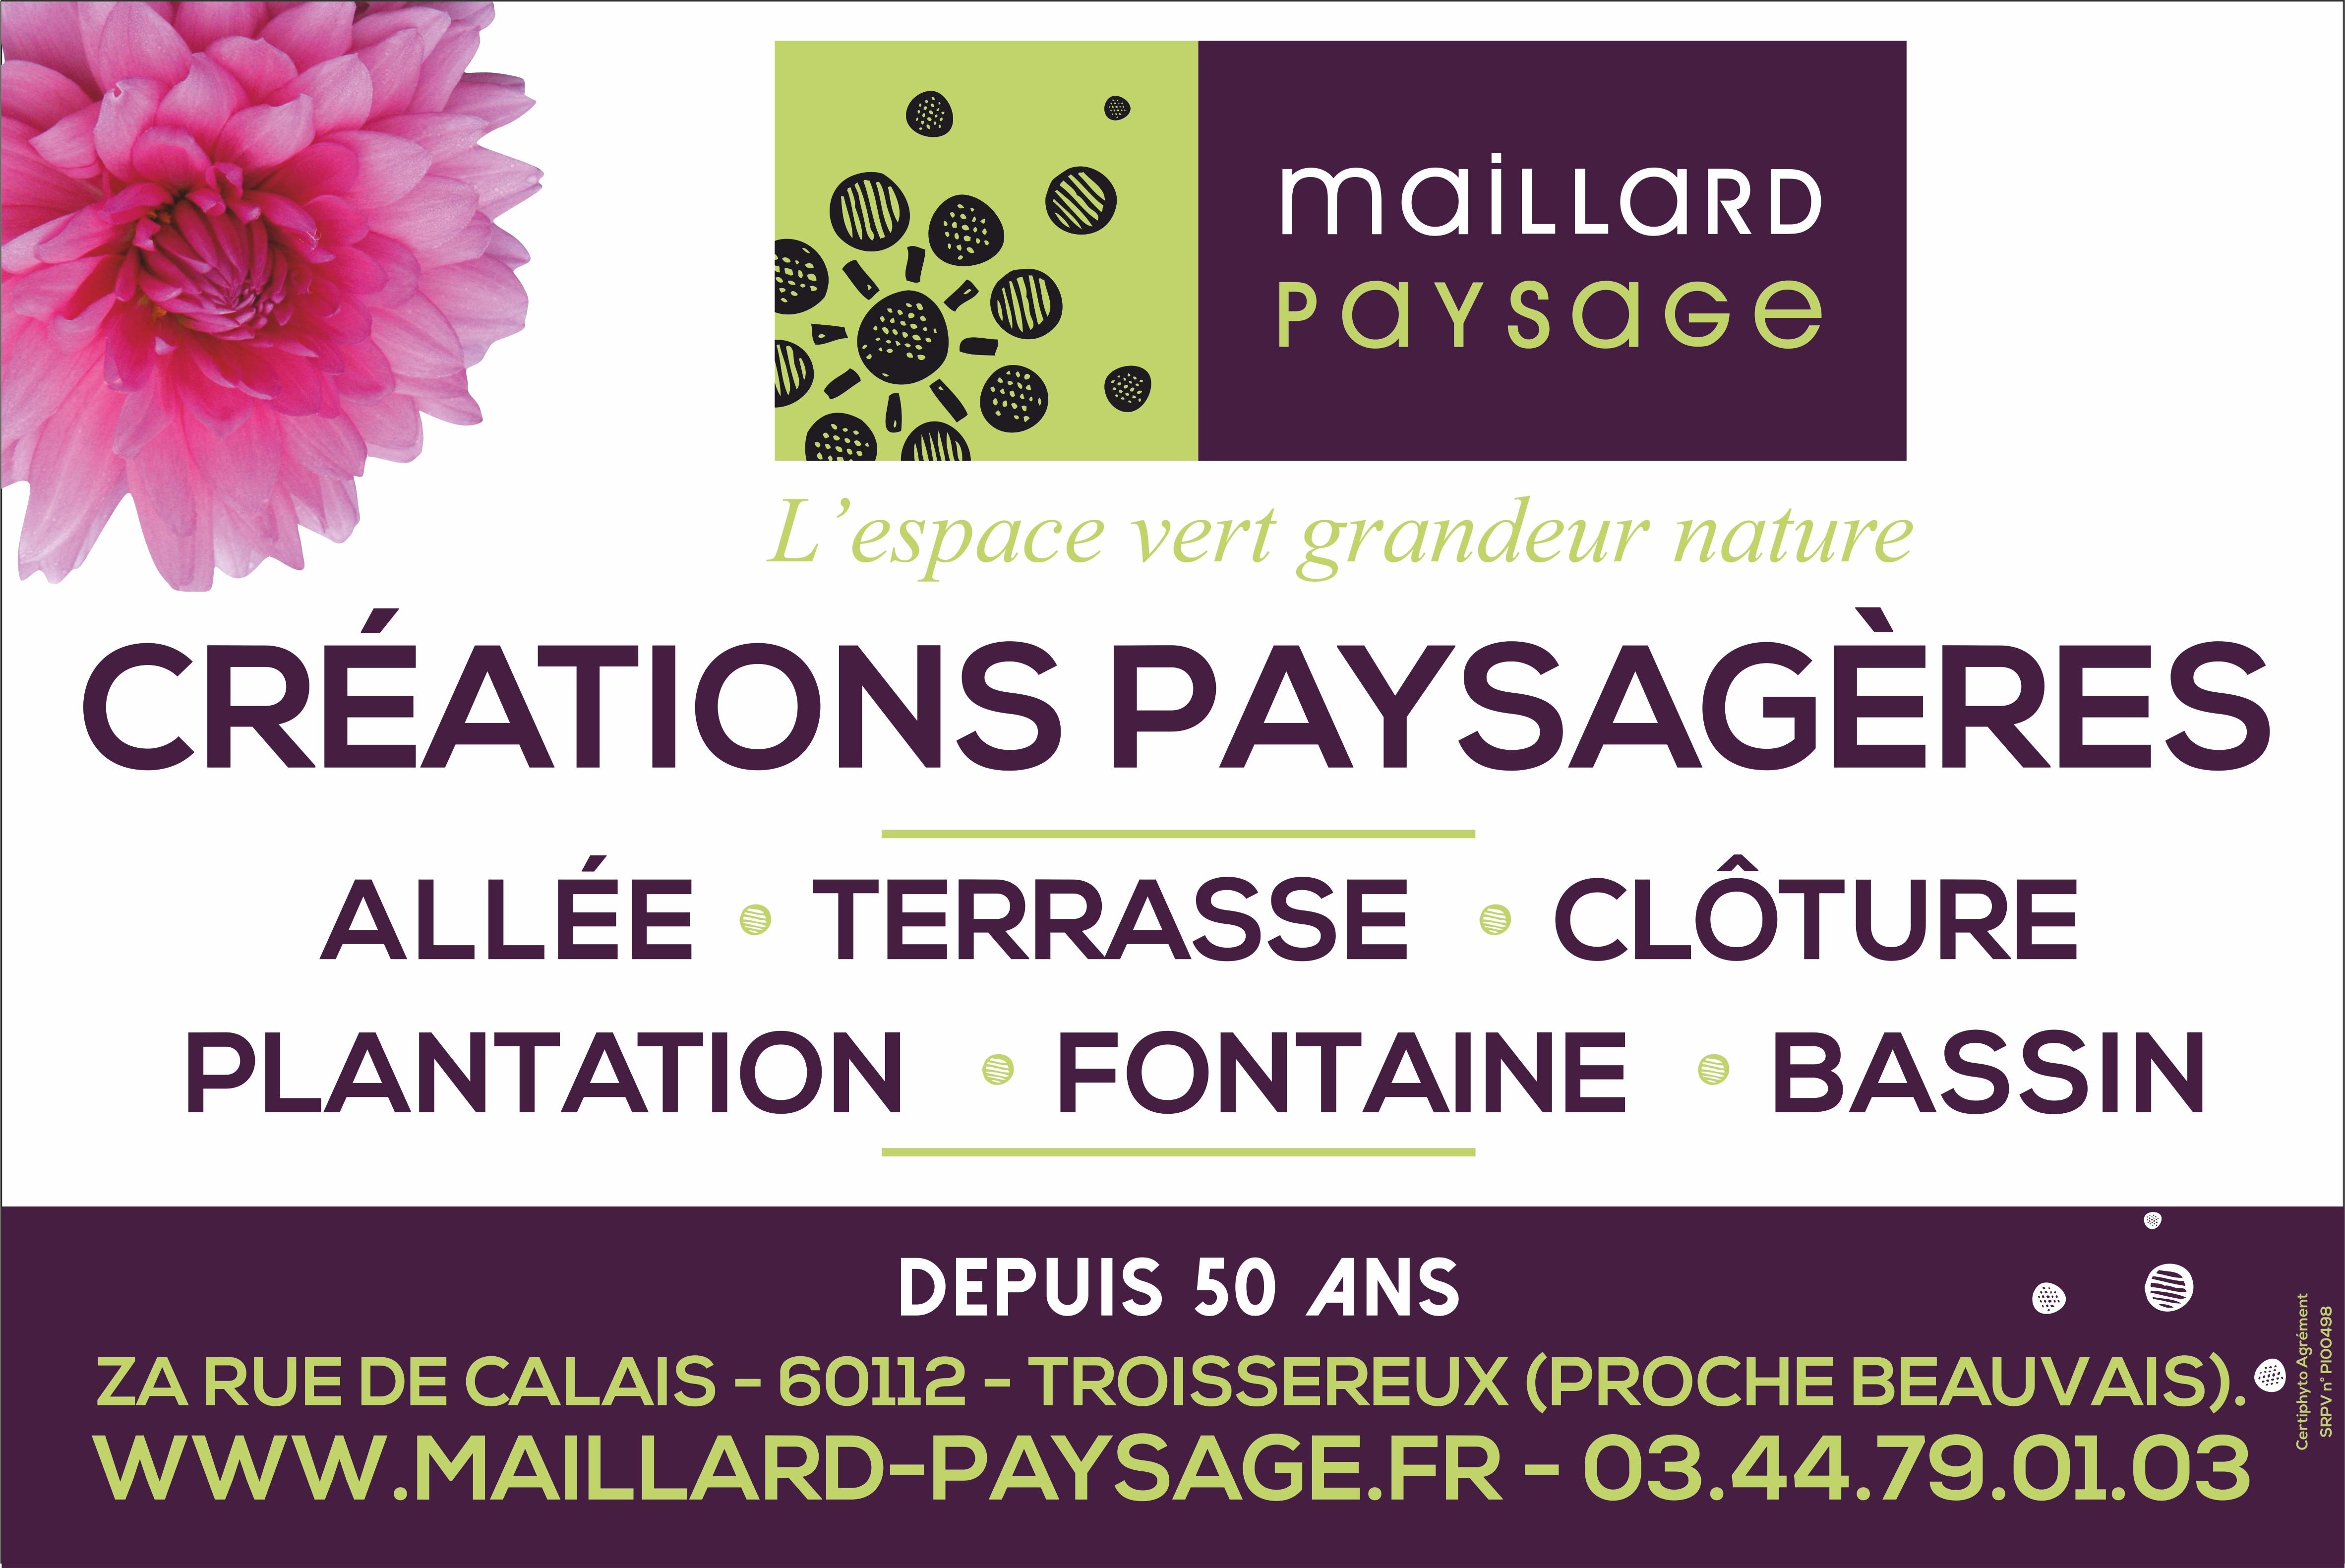 Maillard Paysage